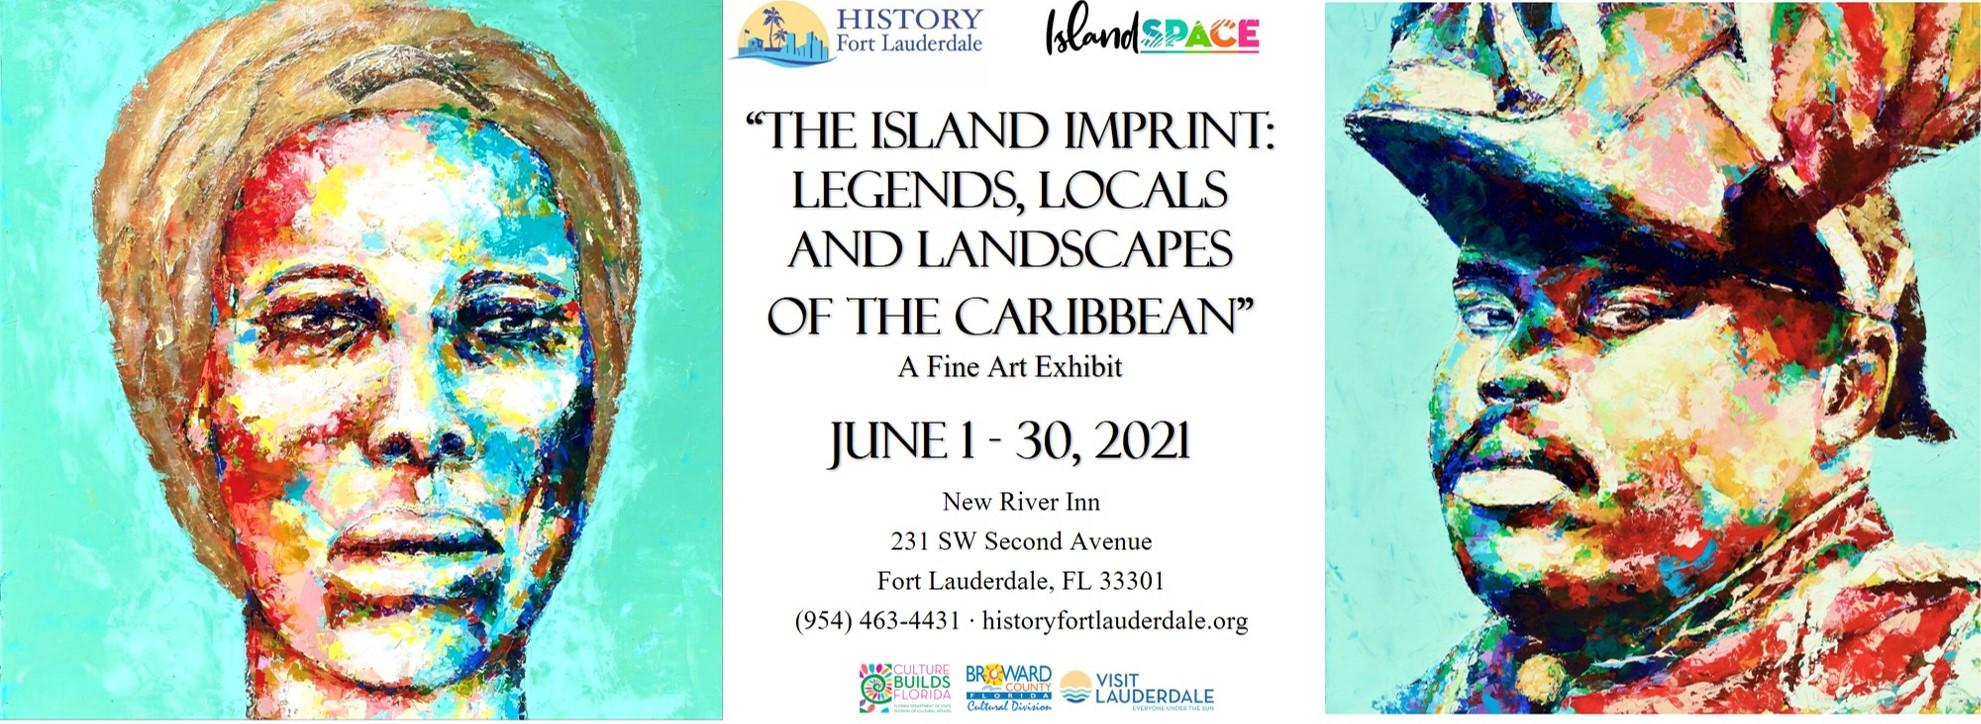 Island Imprint Collage JPG